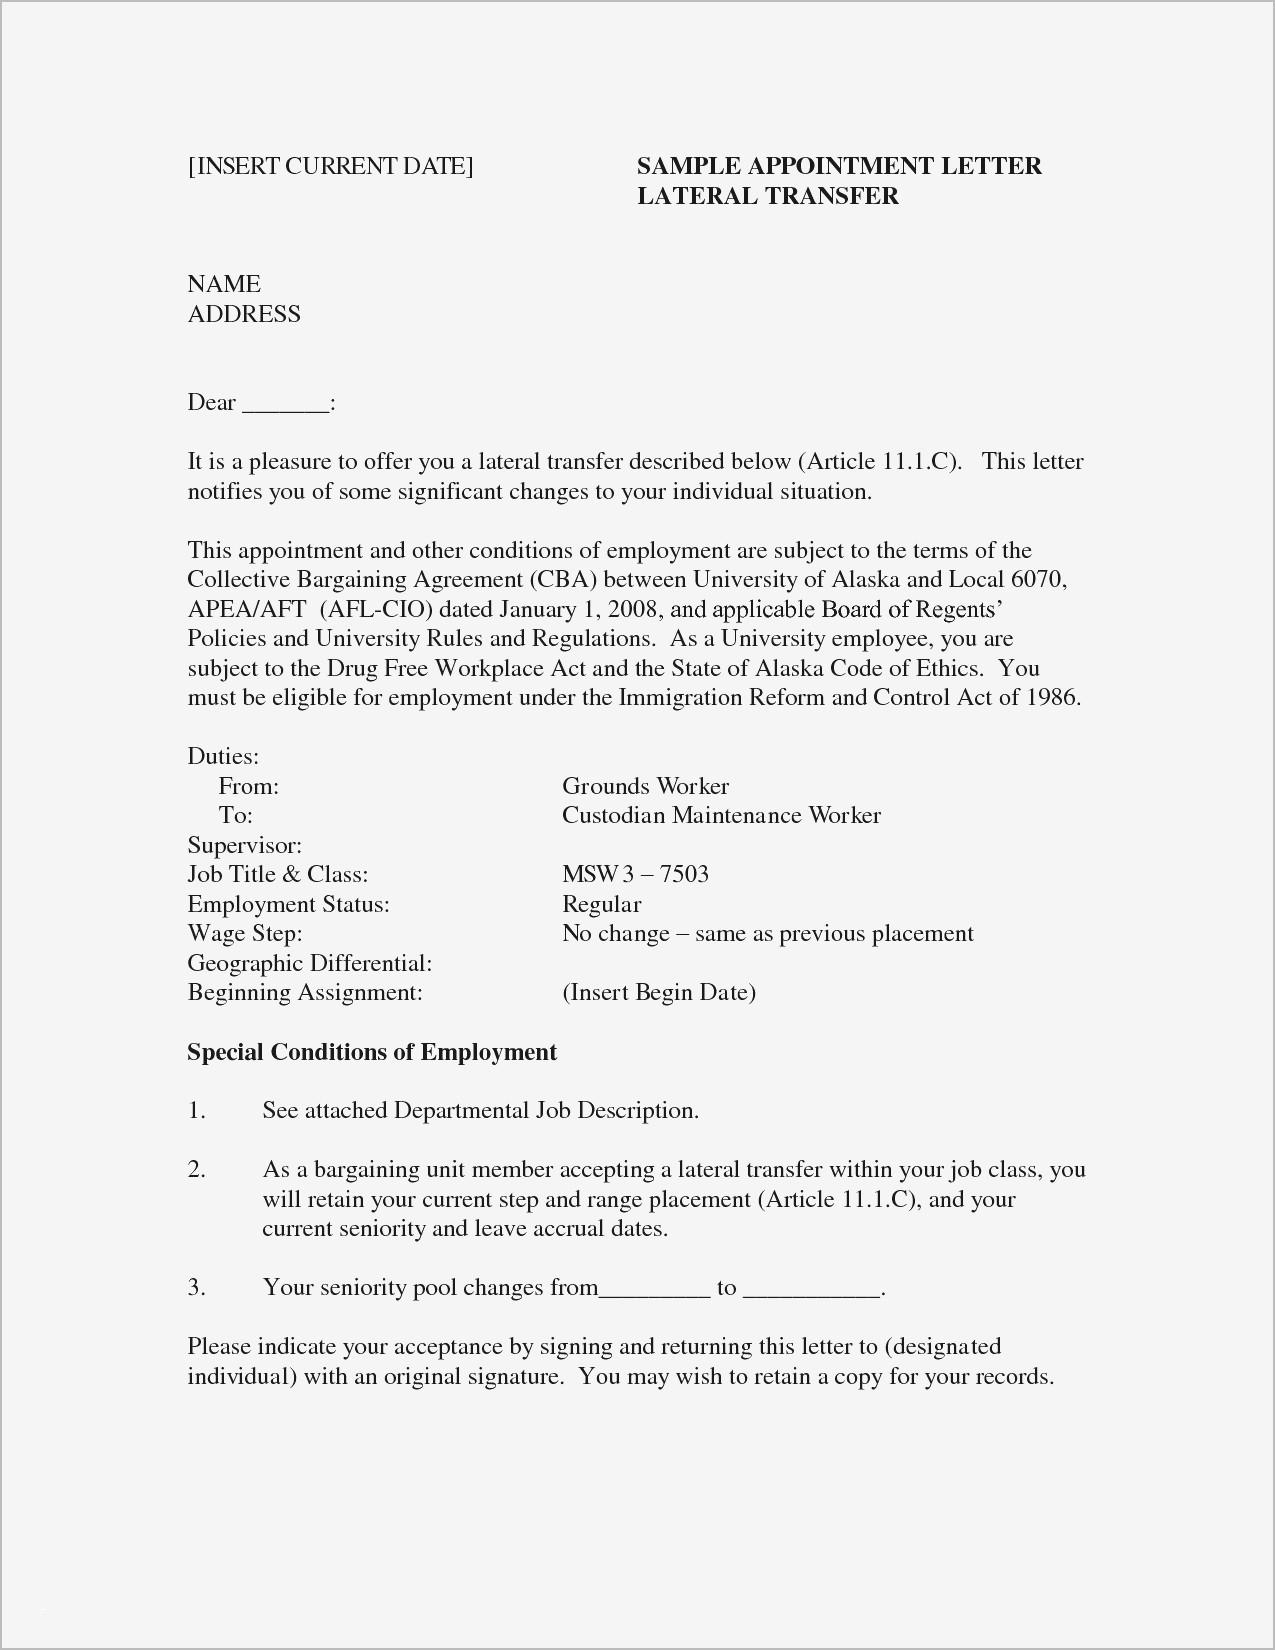 teacher letter template Collection-Behavior Letter To Parents From Teacher Template 2018 Math Teacher Resume Valid Math Teacher Resume Best Fresh Resume 0d 18-r